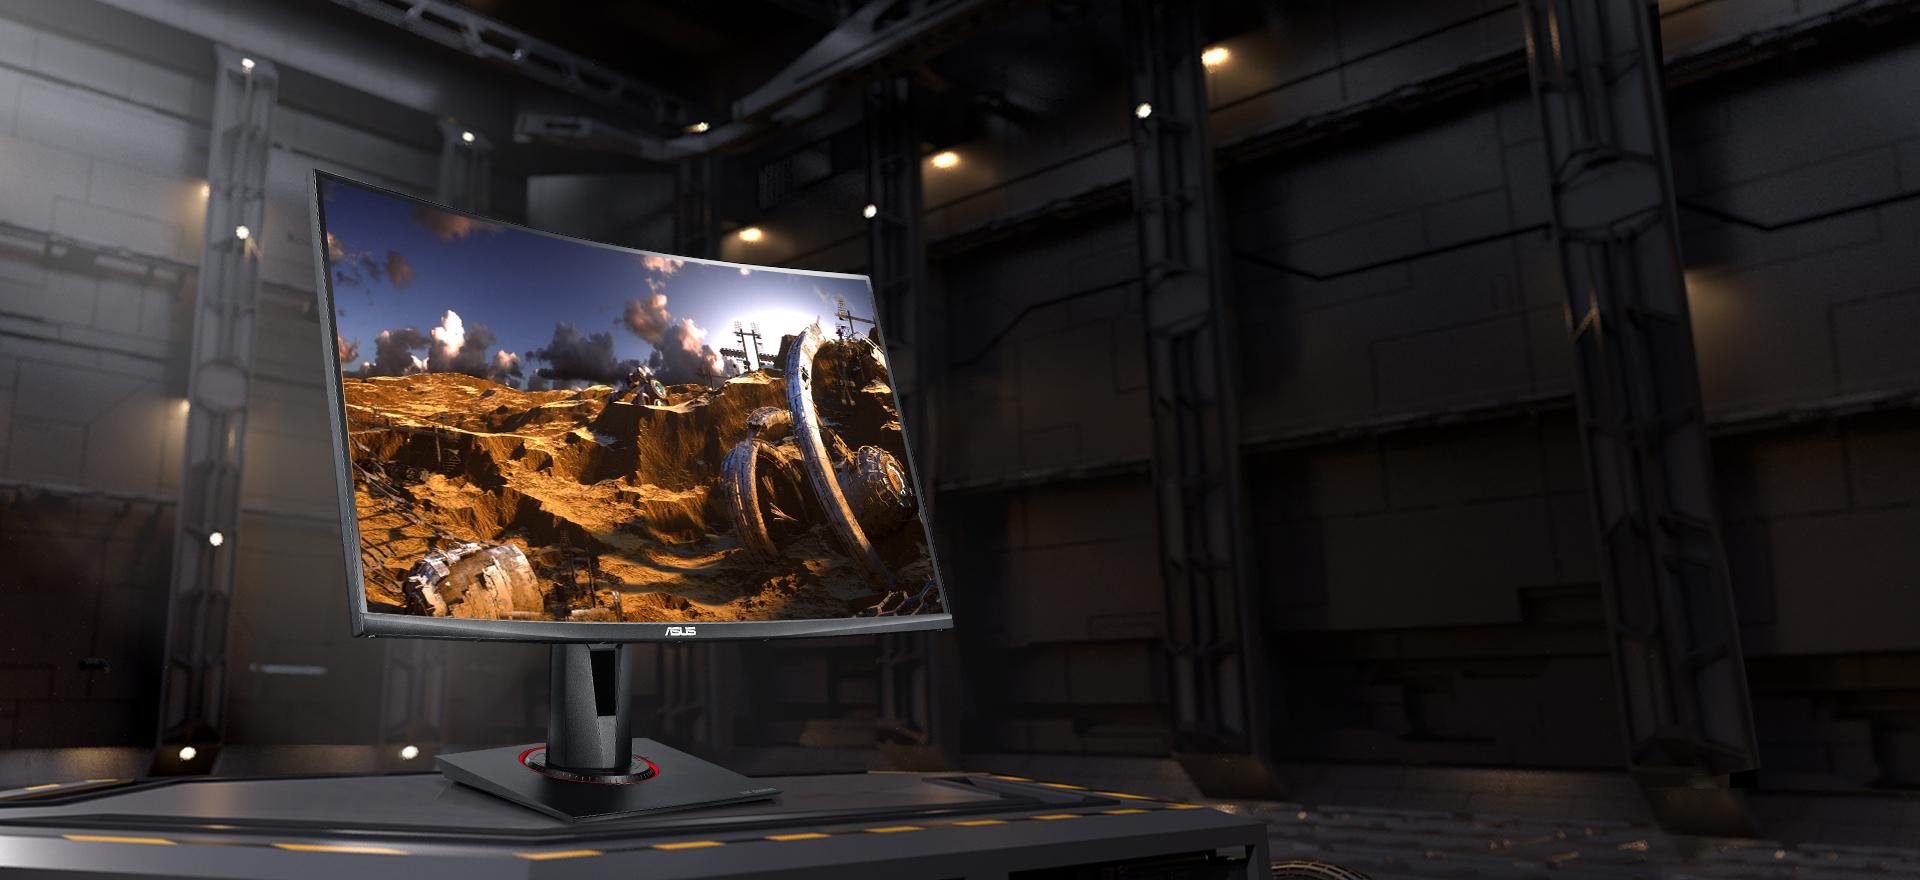 "ASUS TUF Gaming VG27VQ 27"" Full HD 1920 x 1080, 165Hz, Extreme Low ..."